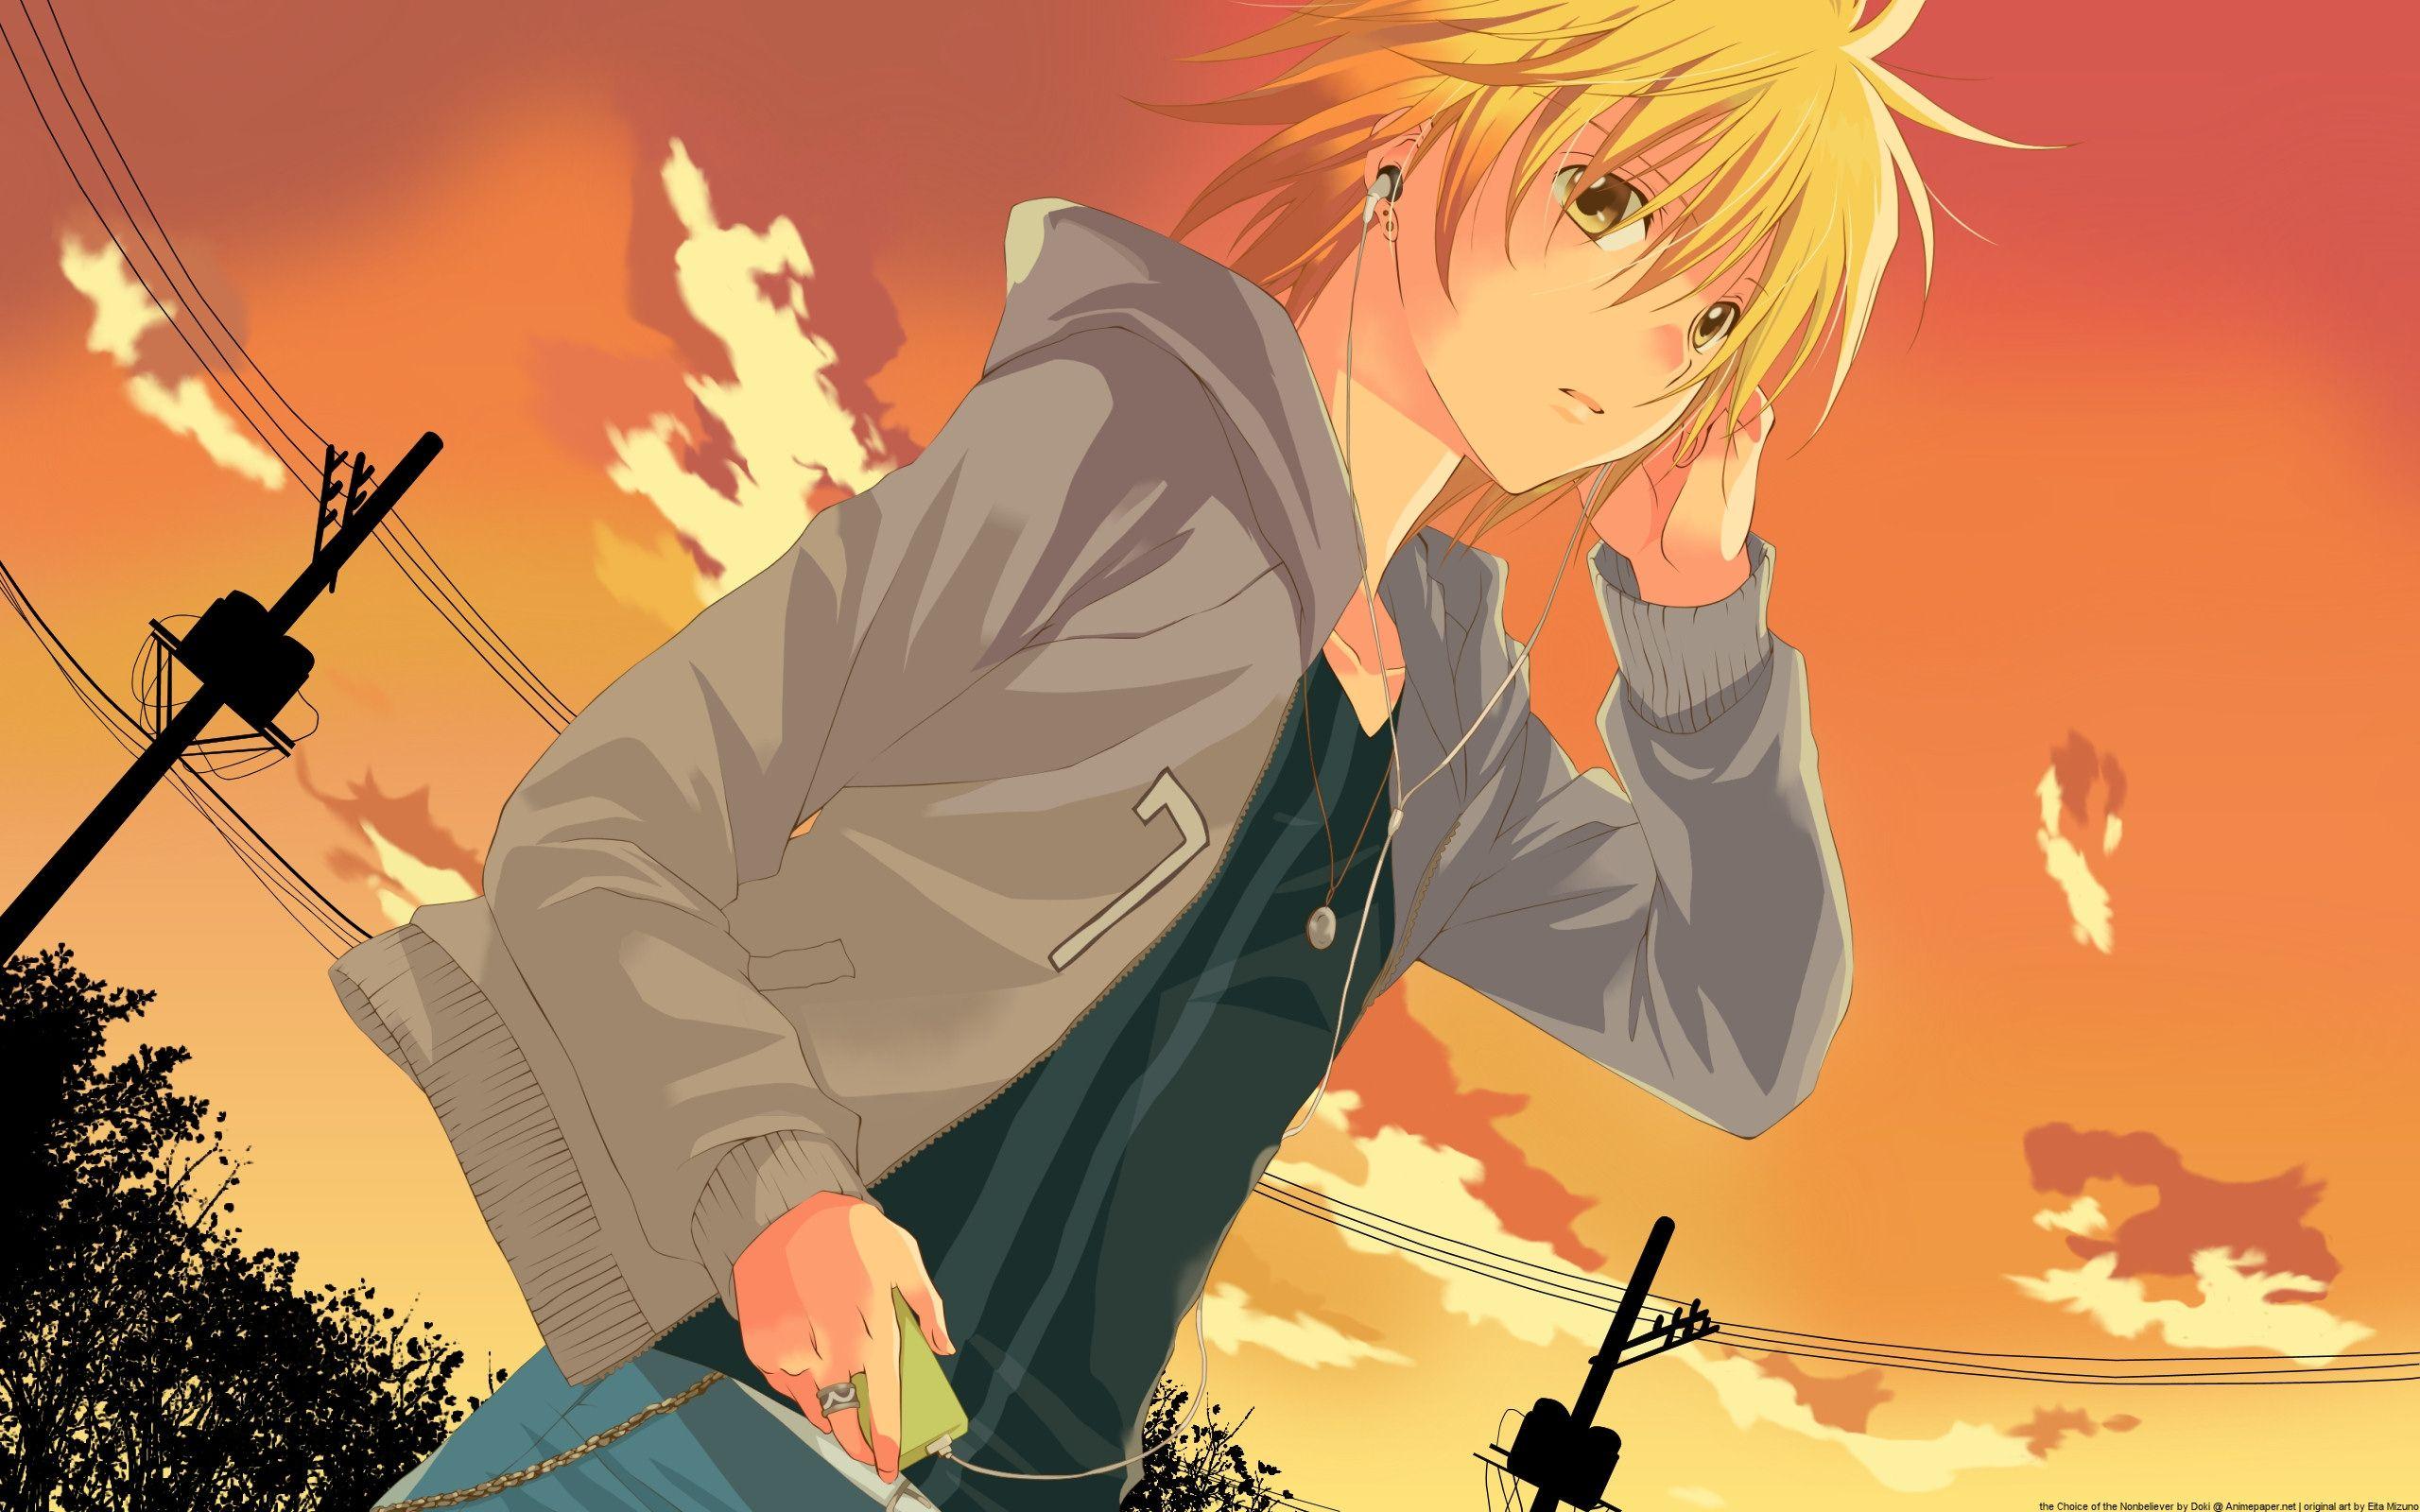 High Quality Anime Boy Wallpaper Full HD Pictures Imagem